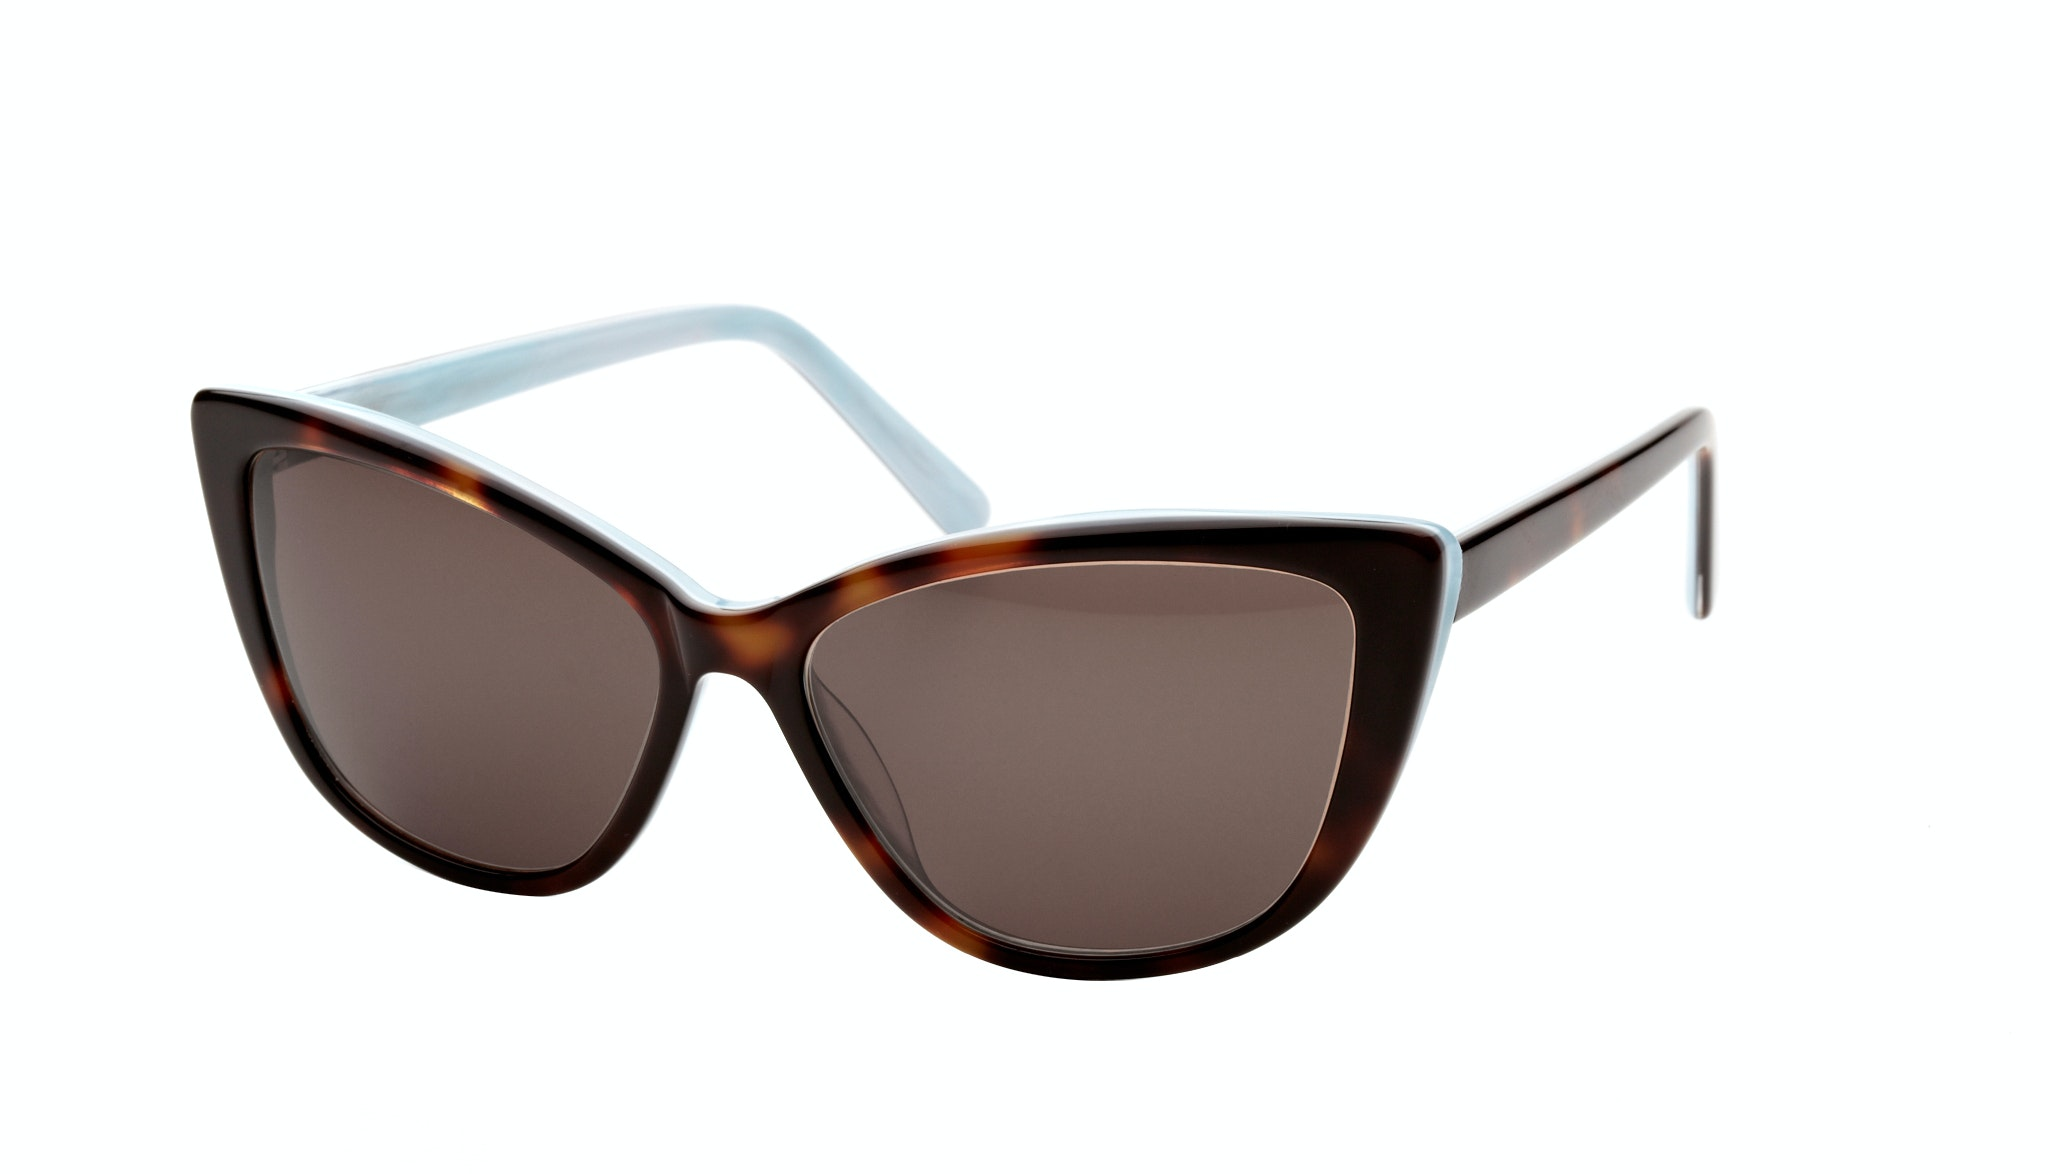 Affordable Fashion Glasses Cat Eye Sunglasses Women Dolled Up Dreamy Tortoise Tilt